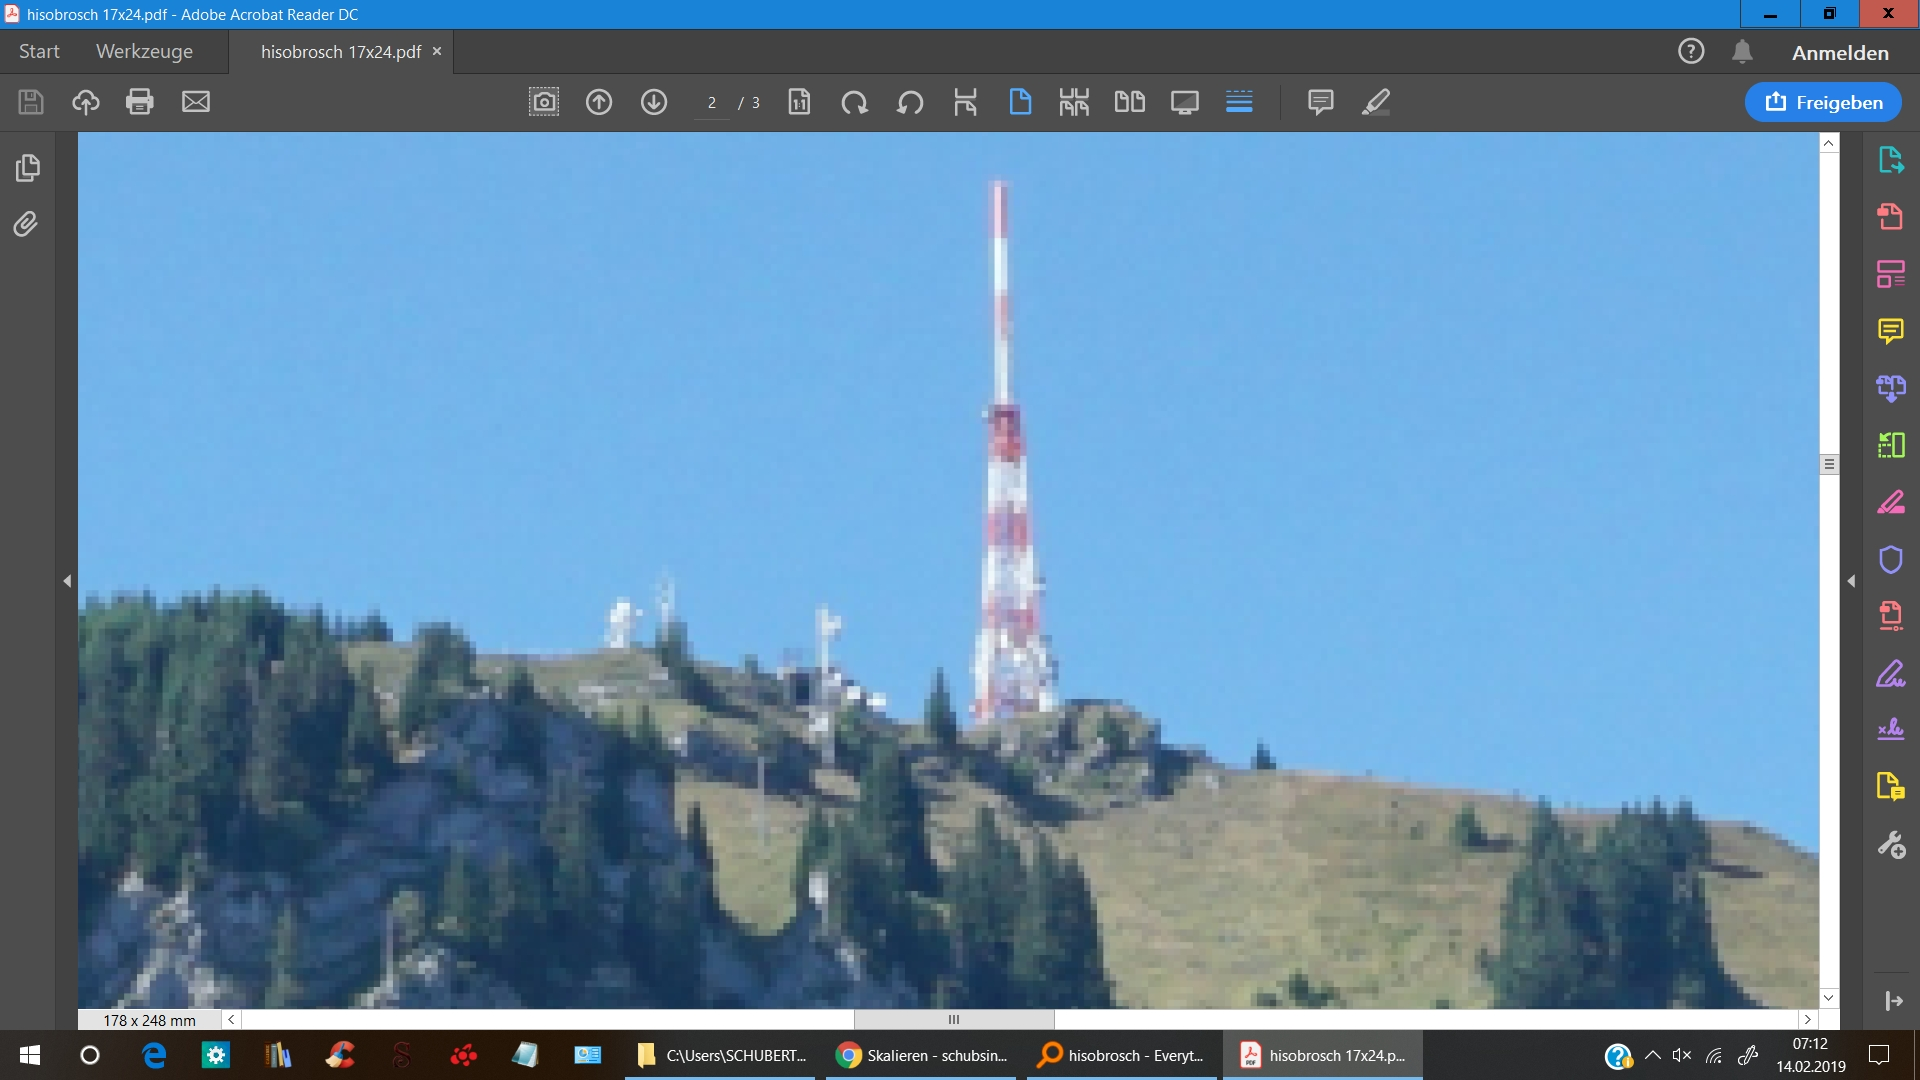 1 Quelldatei 178x248mm aus PDF 1600 Prozent vergrößert